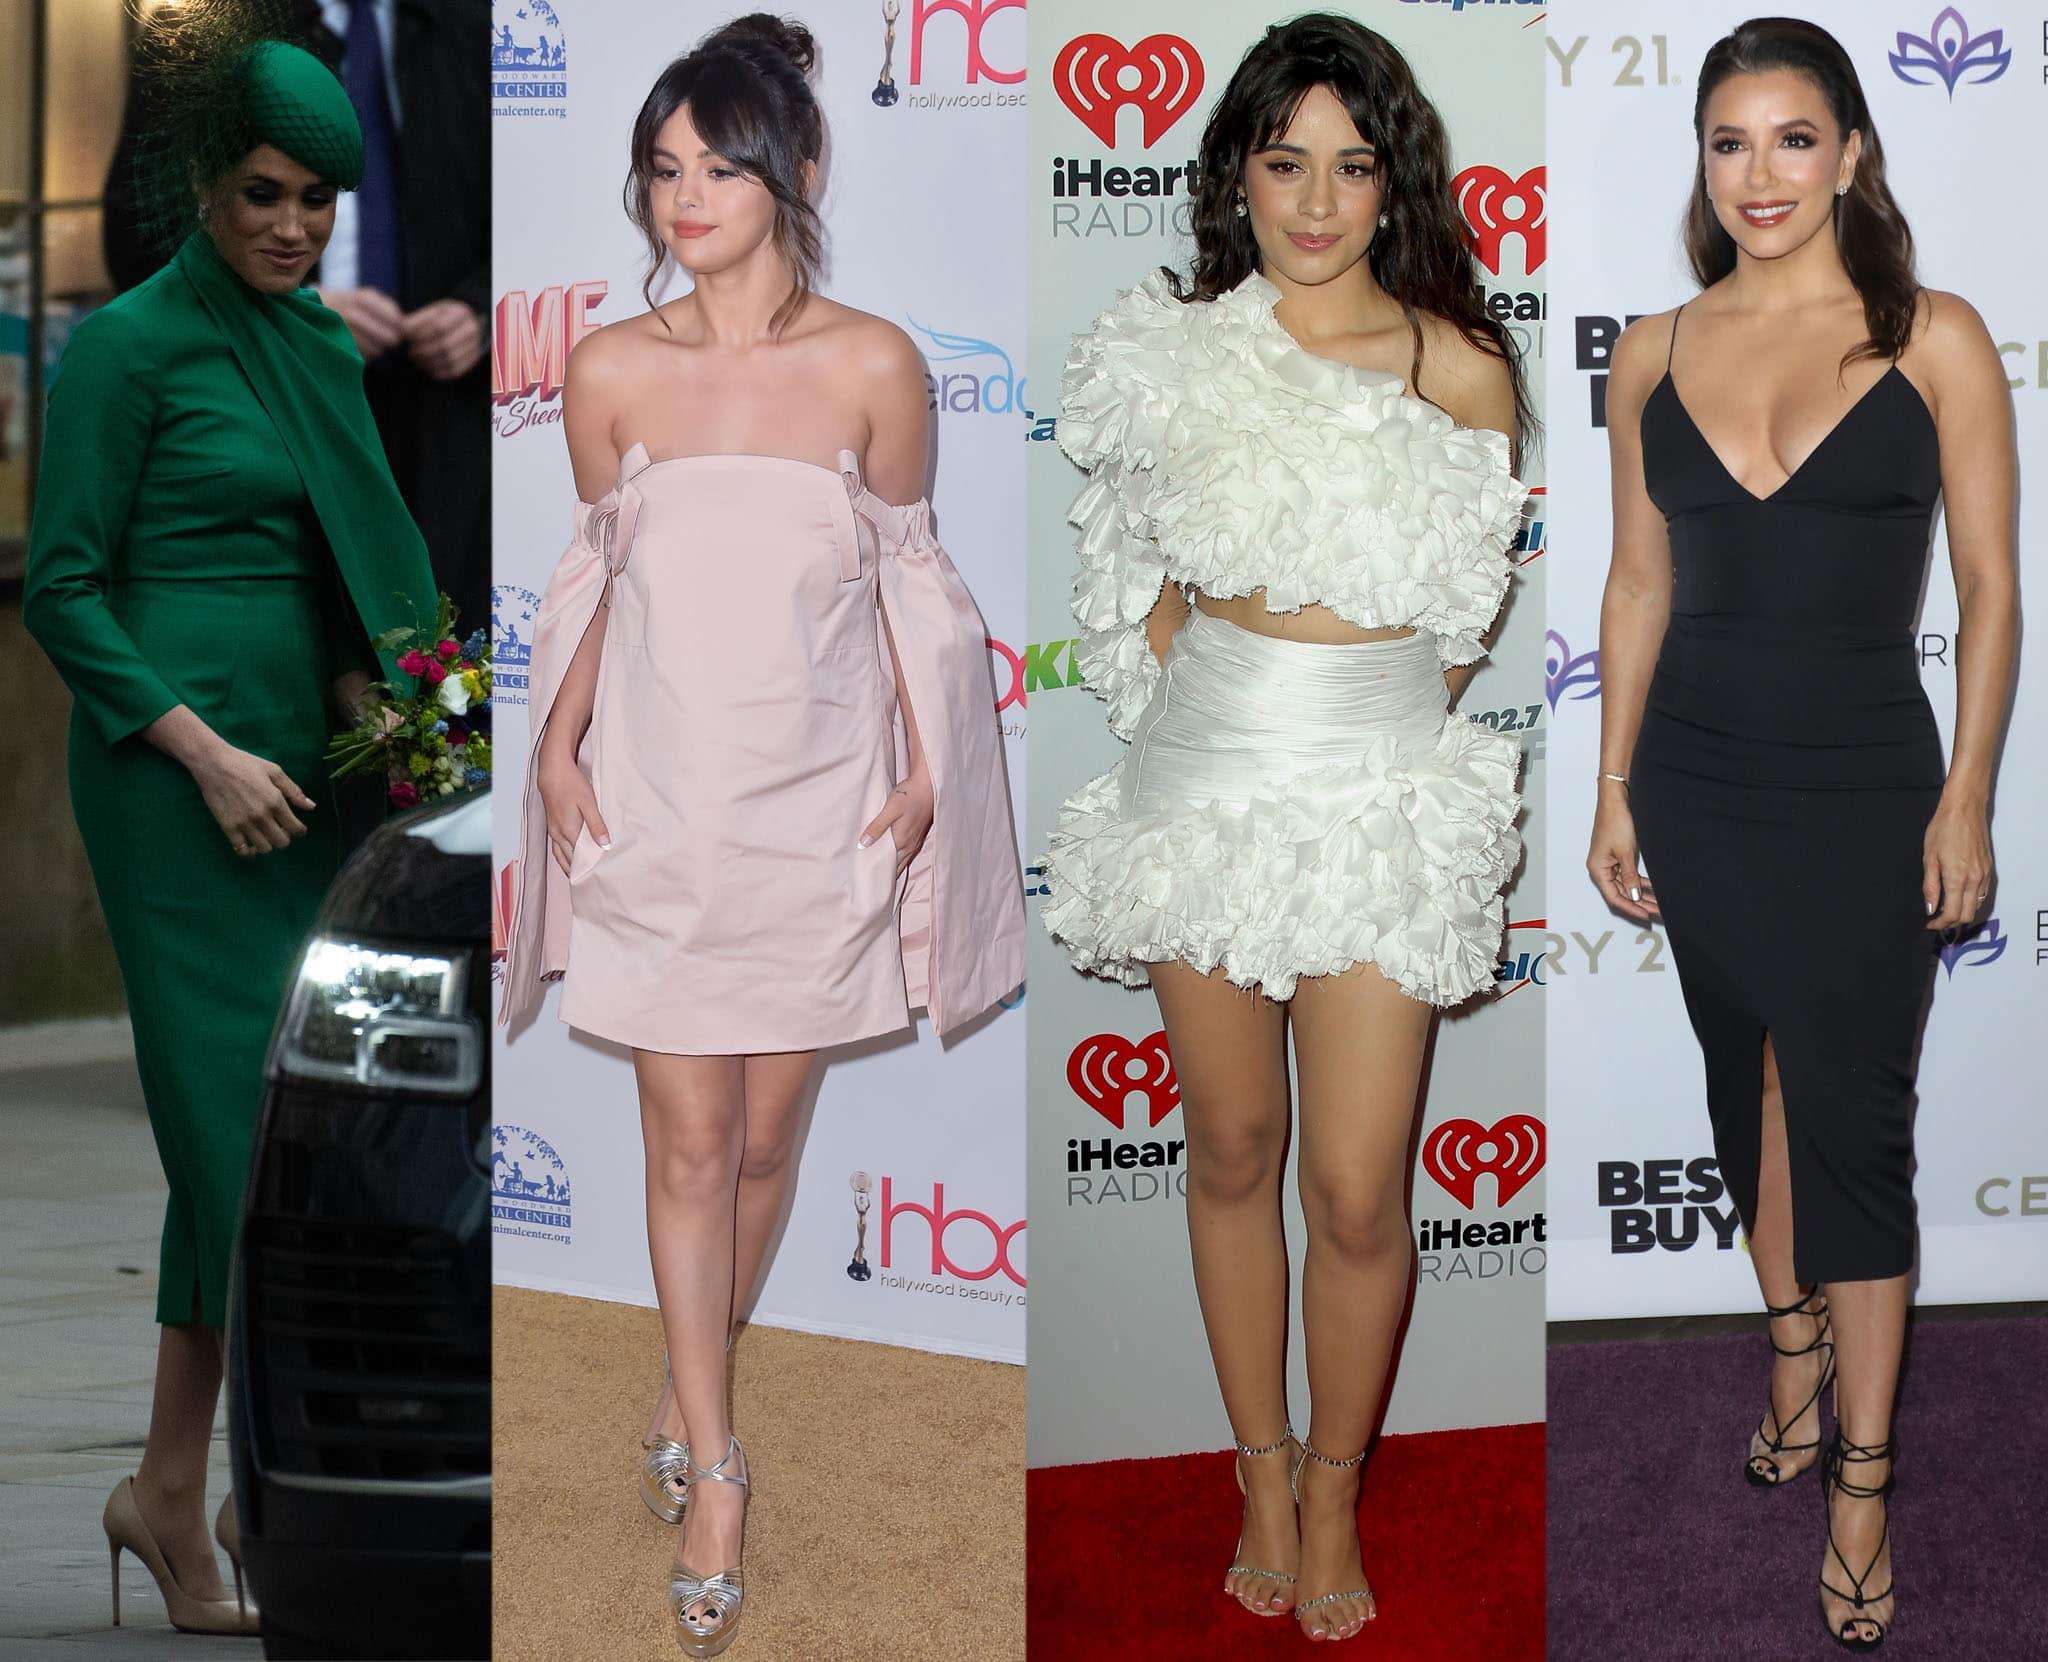 Meghan Markle, Selena Gomez, Camila Cabello, and Eva Longoria wearing their chic Aquazzura heels